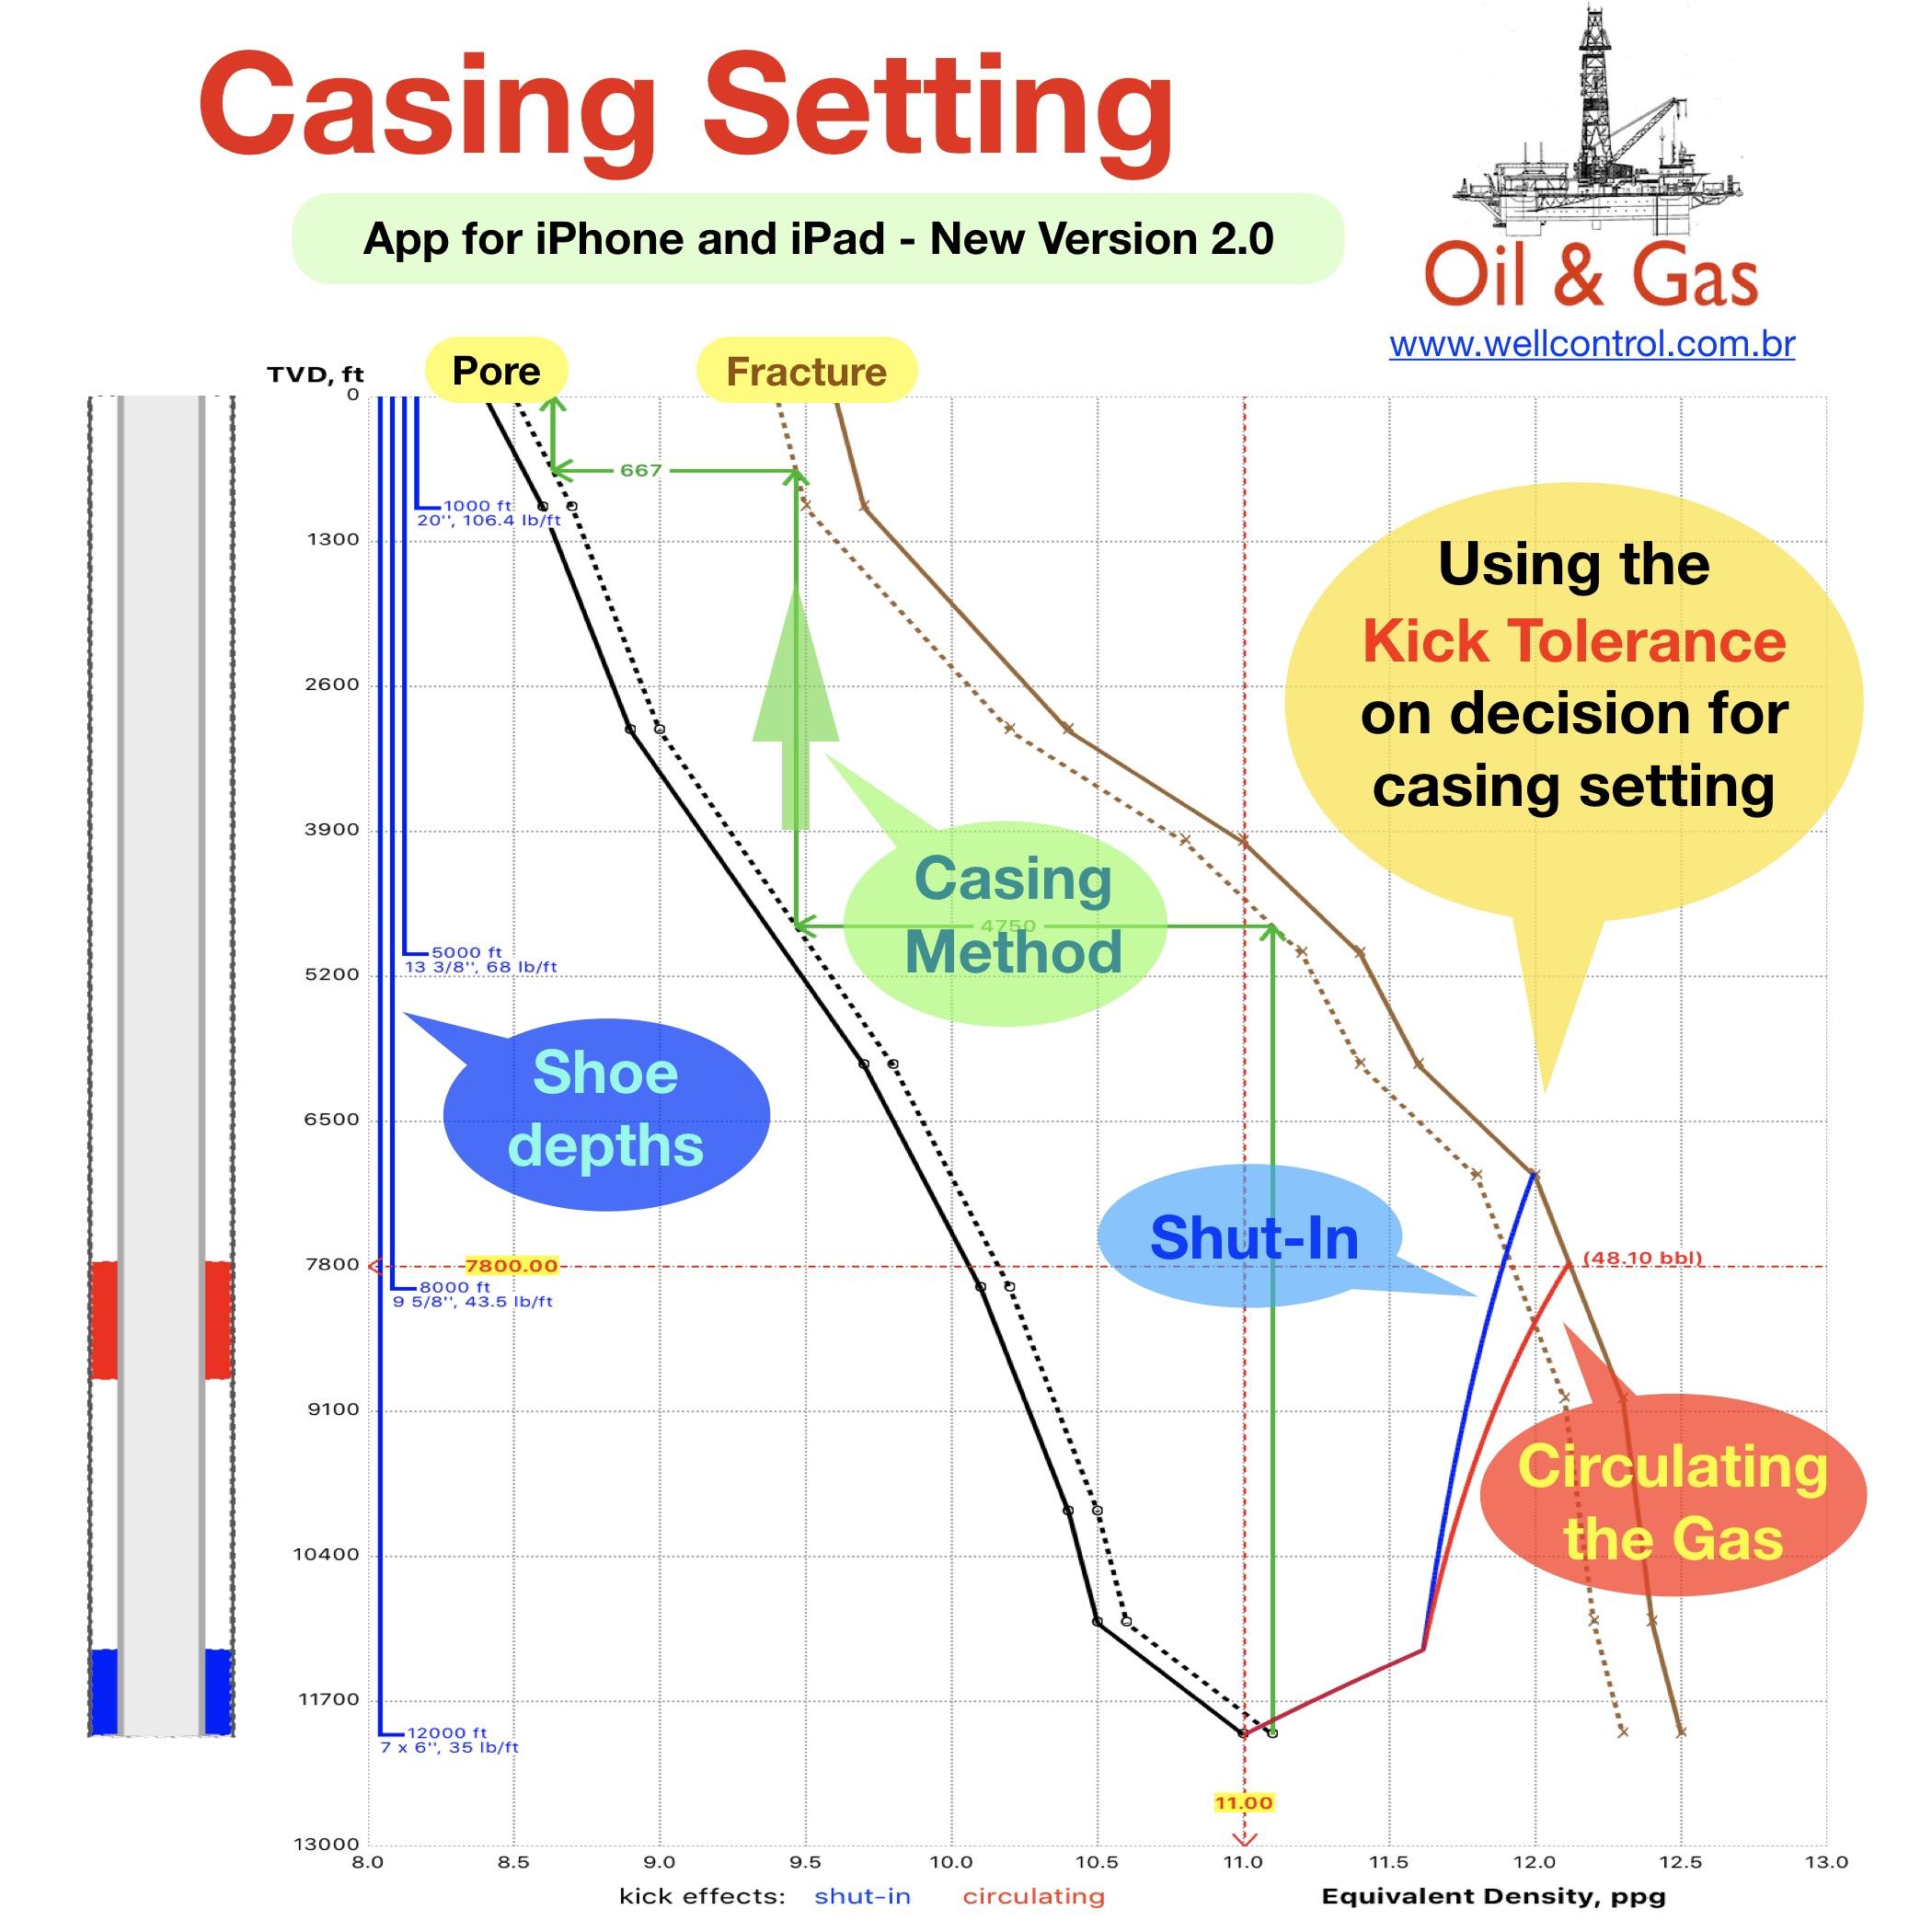 casing_setting_01